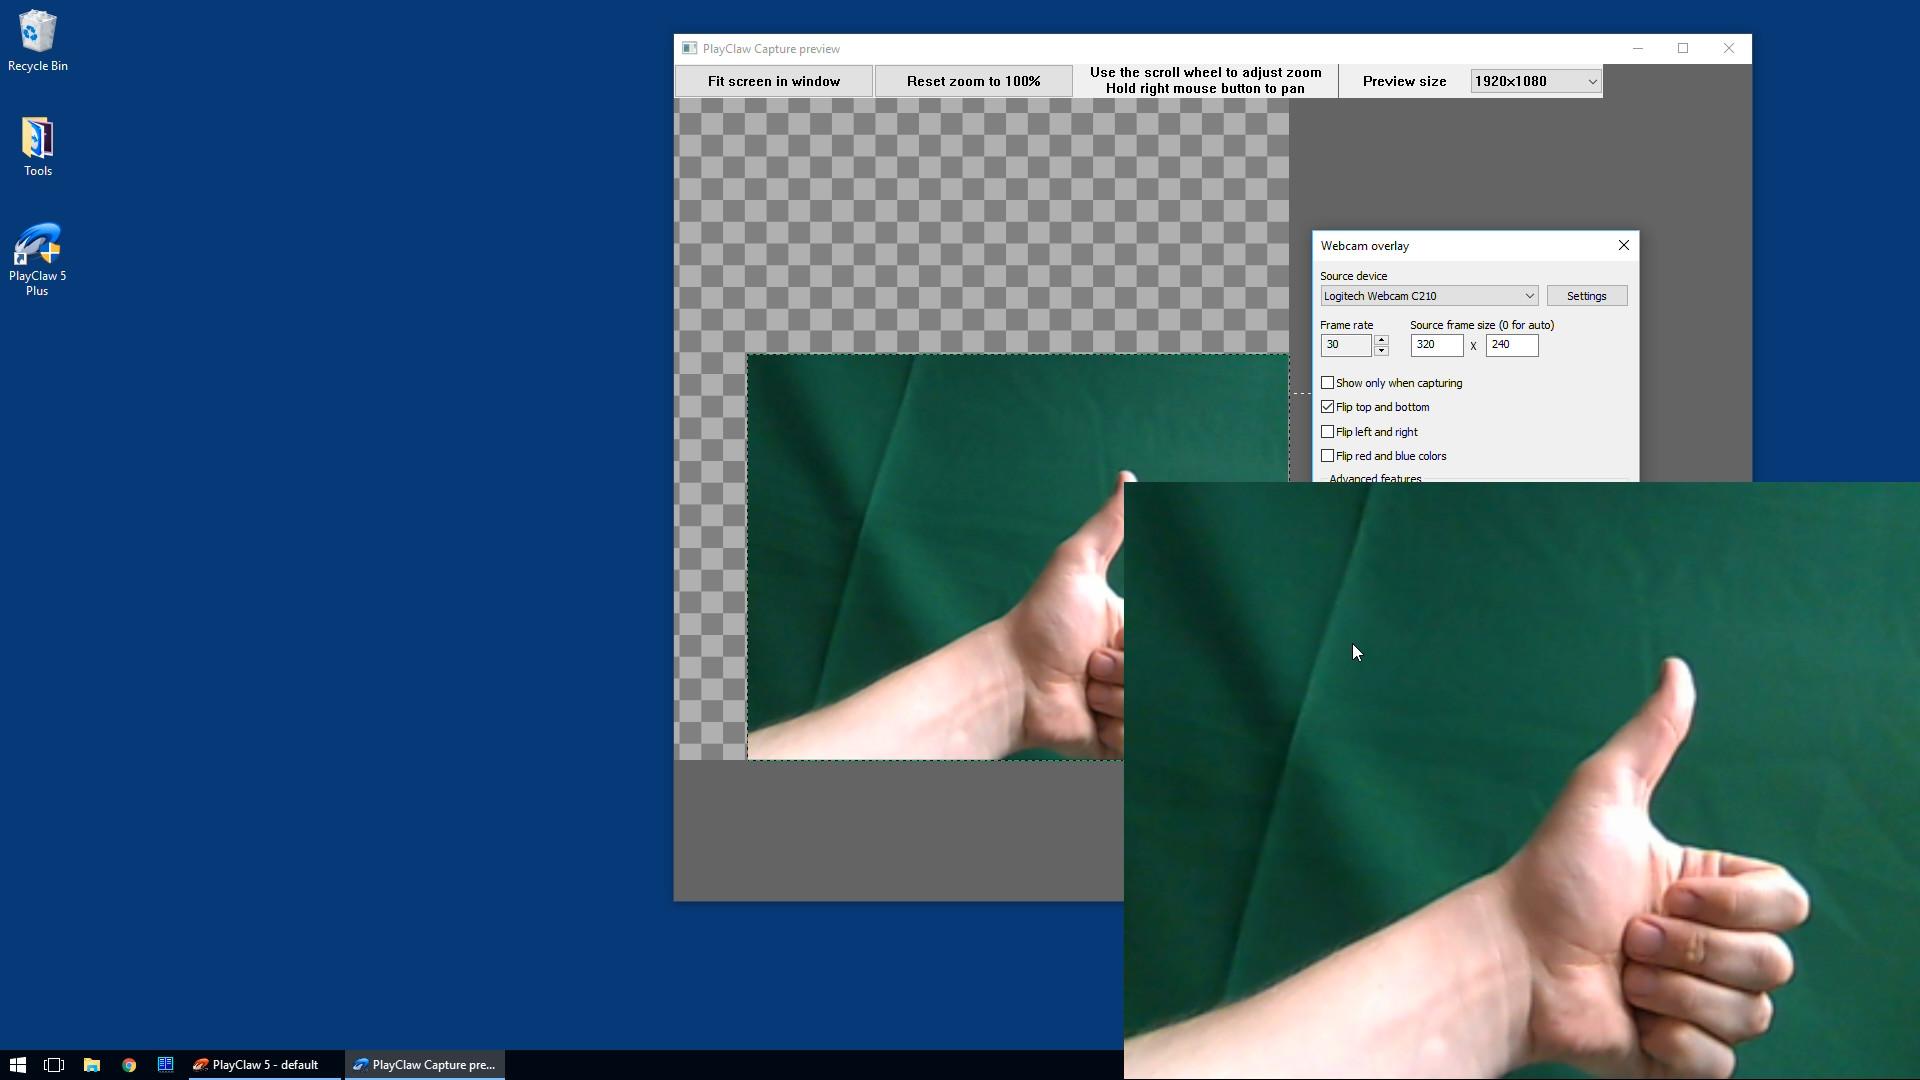 PlayClaw 5 - Chroma Key for overlays screenshot